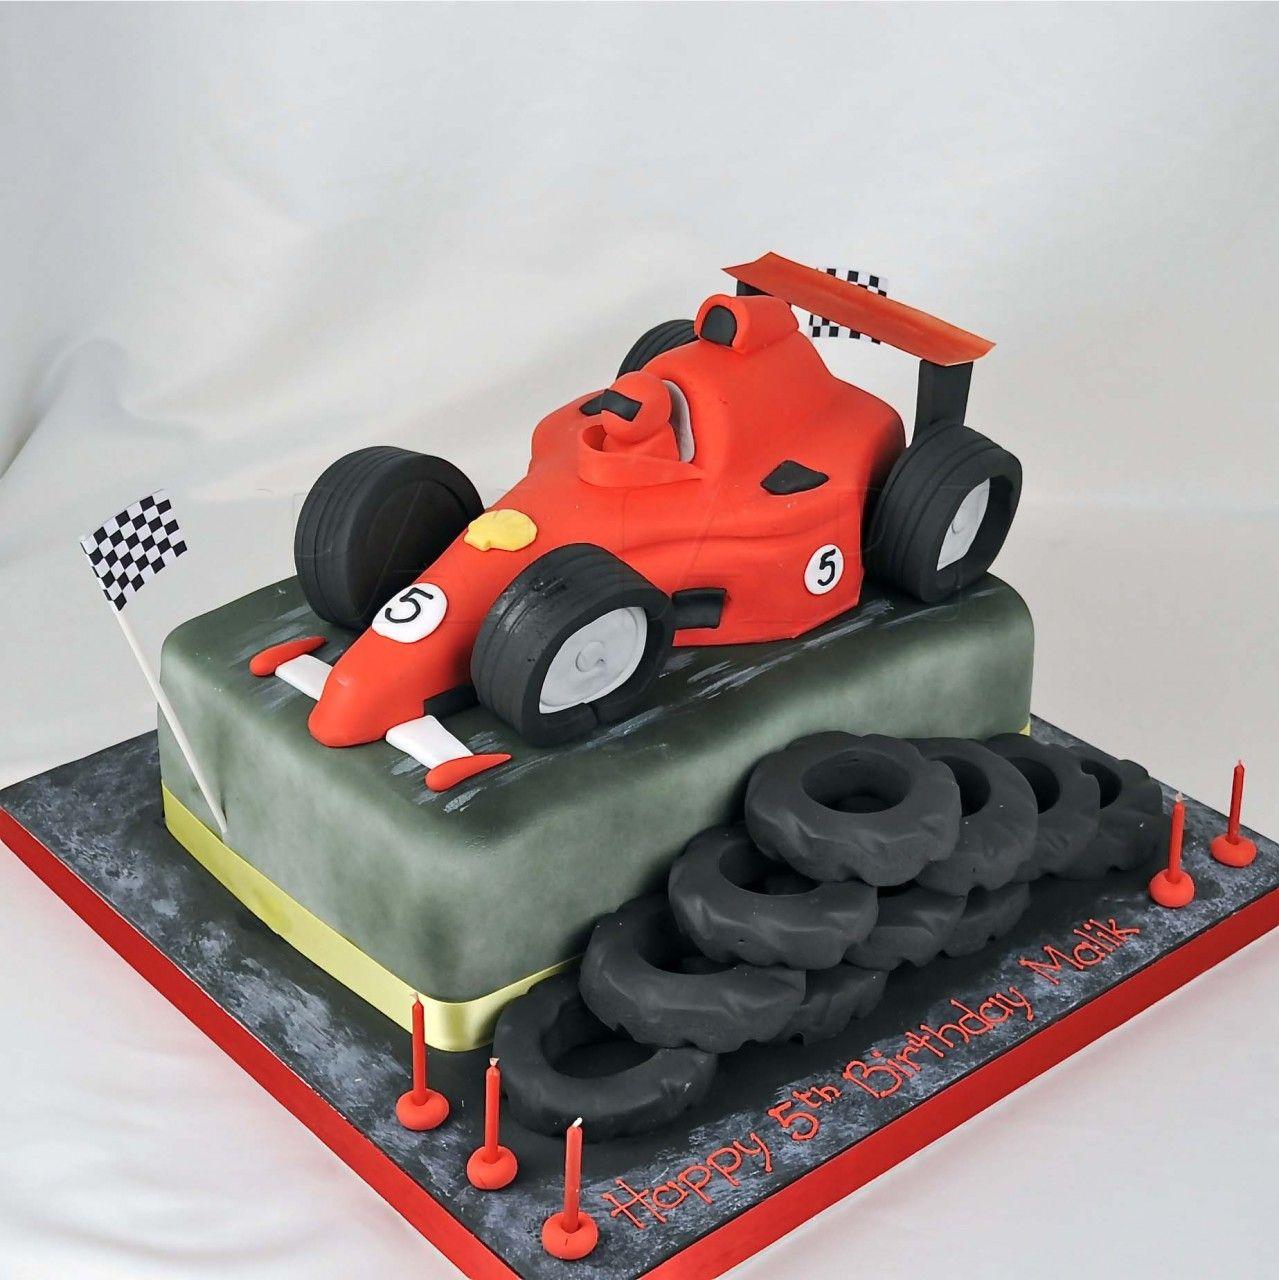 Racing car cake bs0018 panari cakes cakepins race car party racing car cake bs0018 panari cakes cakepins baditri Choice Image